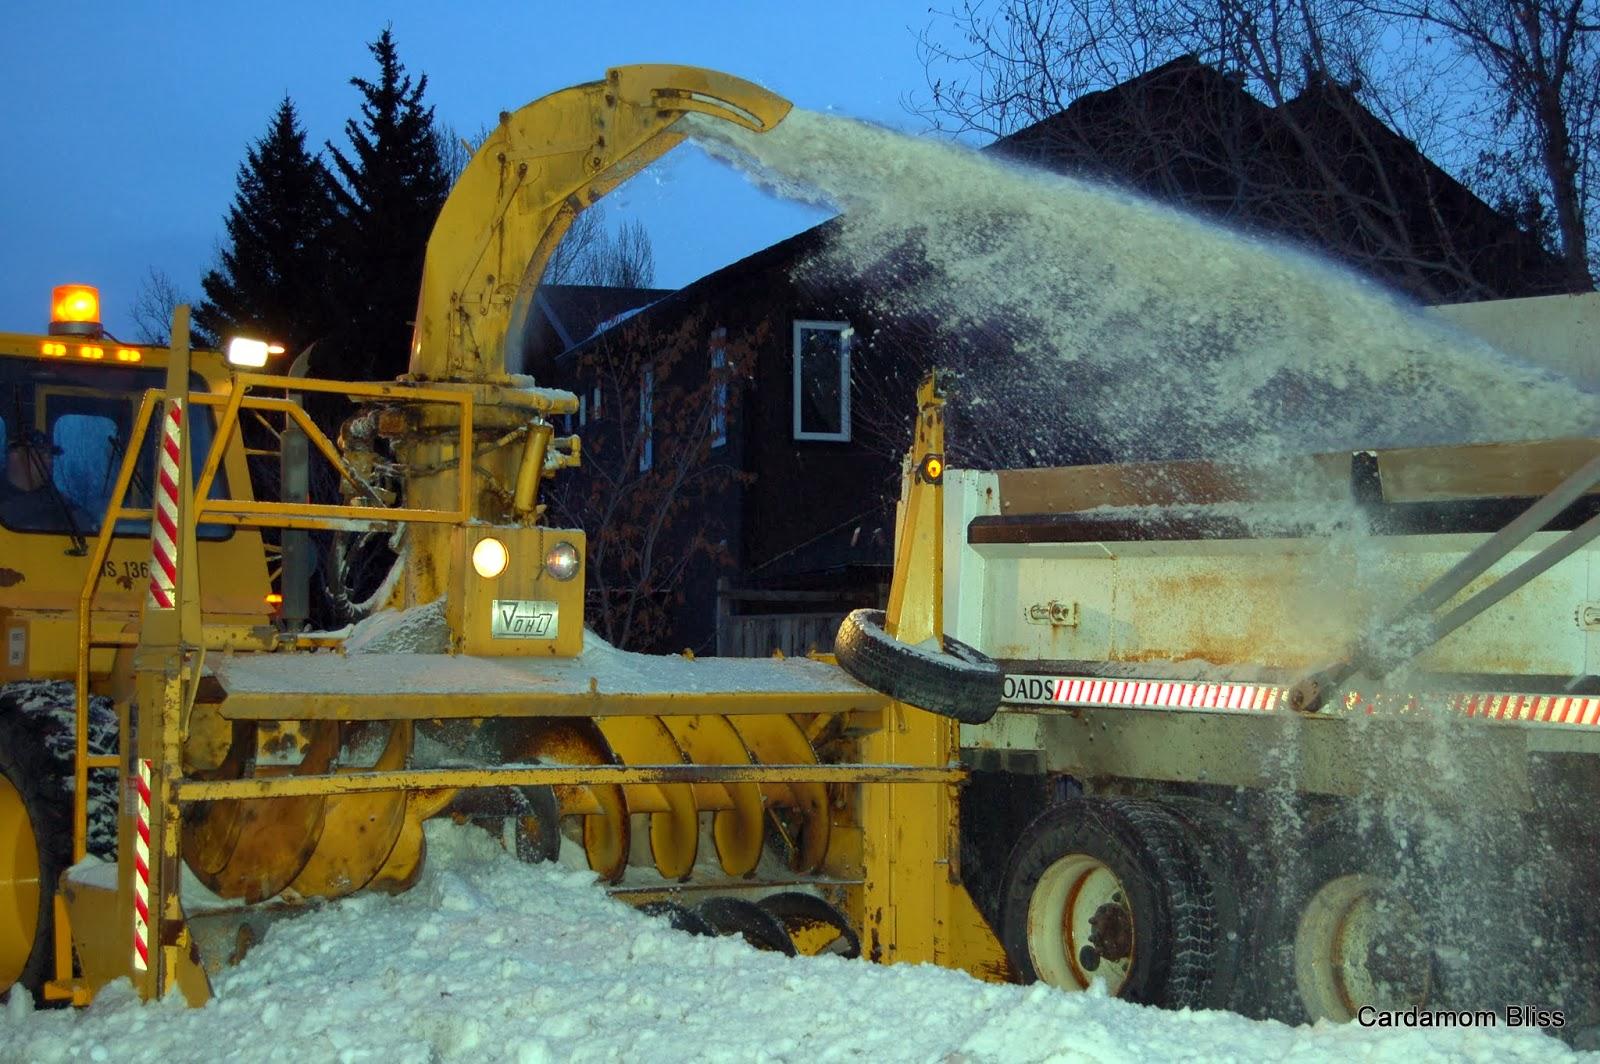 Grinding blades churn rocky, icy snow into fine powder